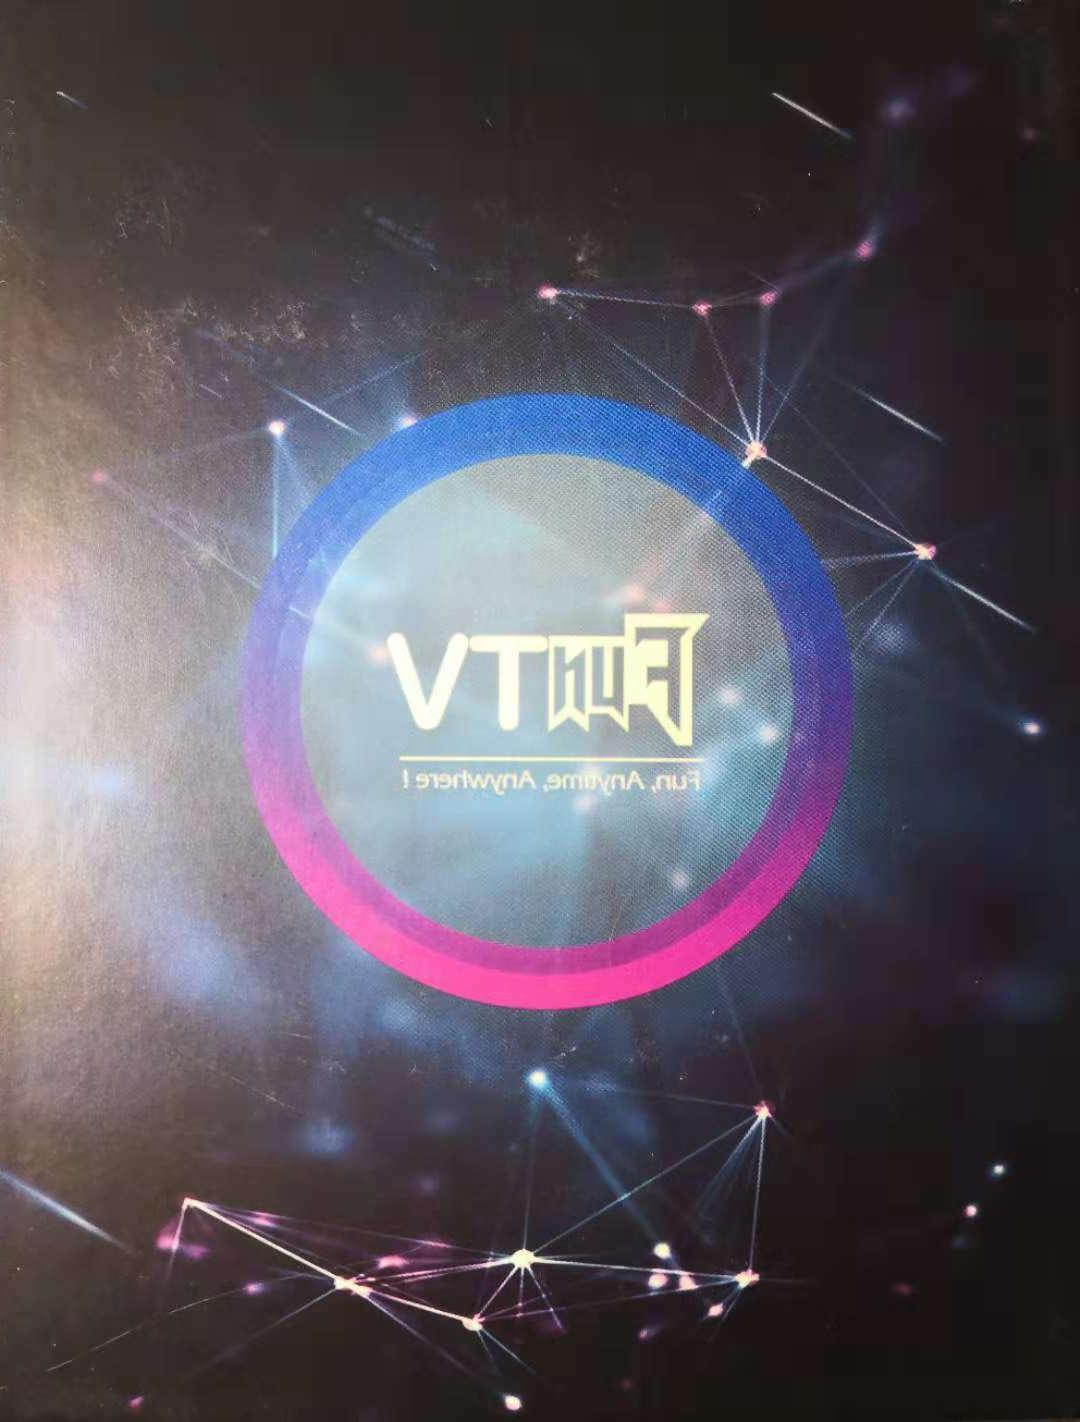 2019 FUN TV Box 3 Chinese/HK/TW/Vietnam TV Live